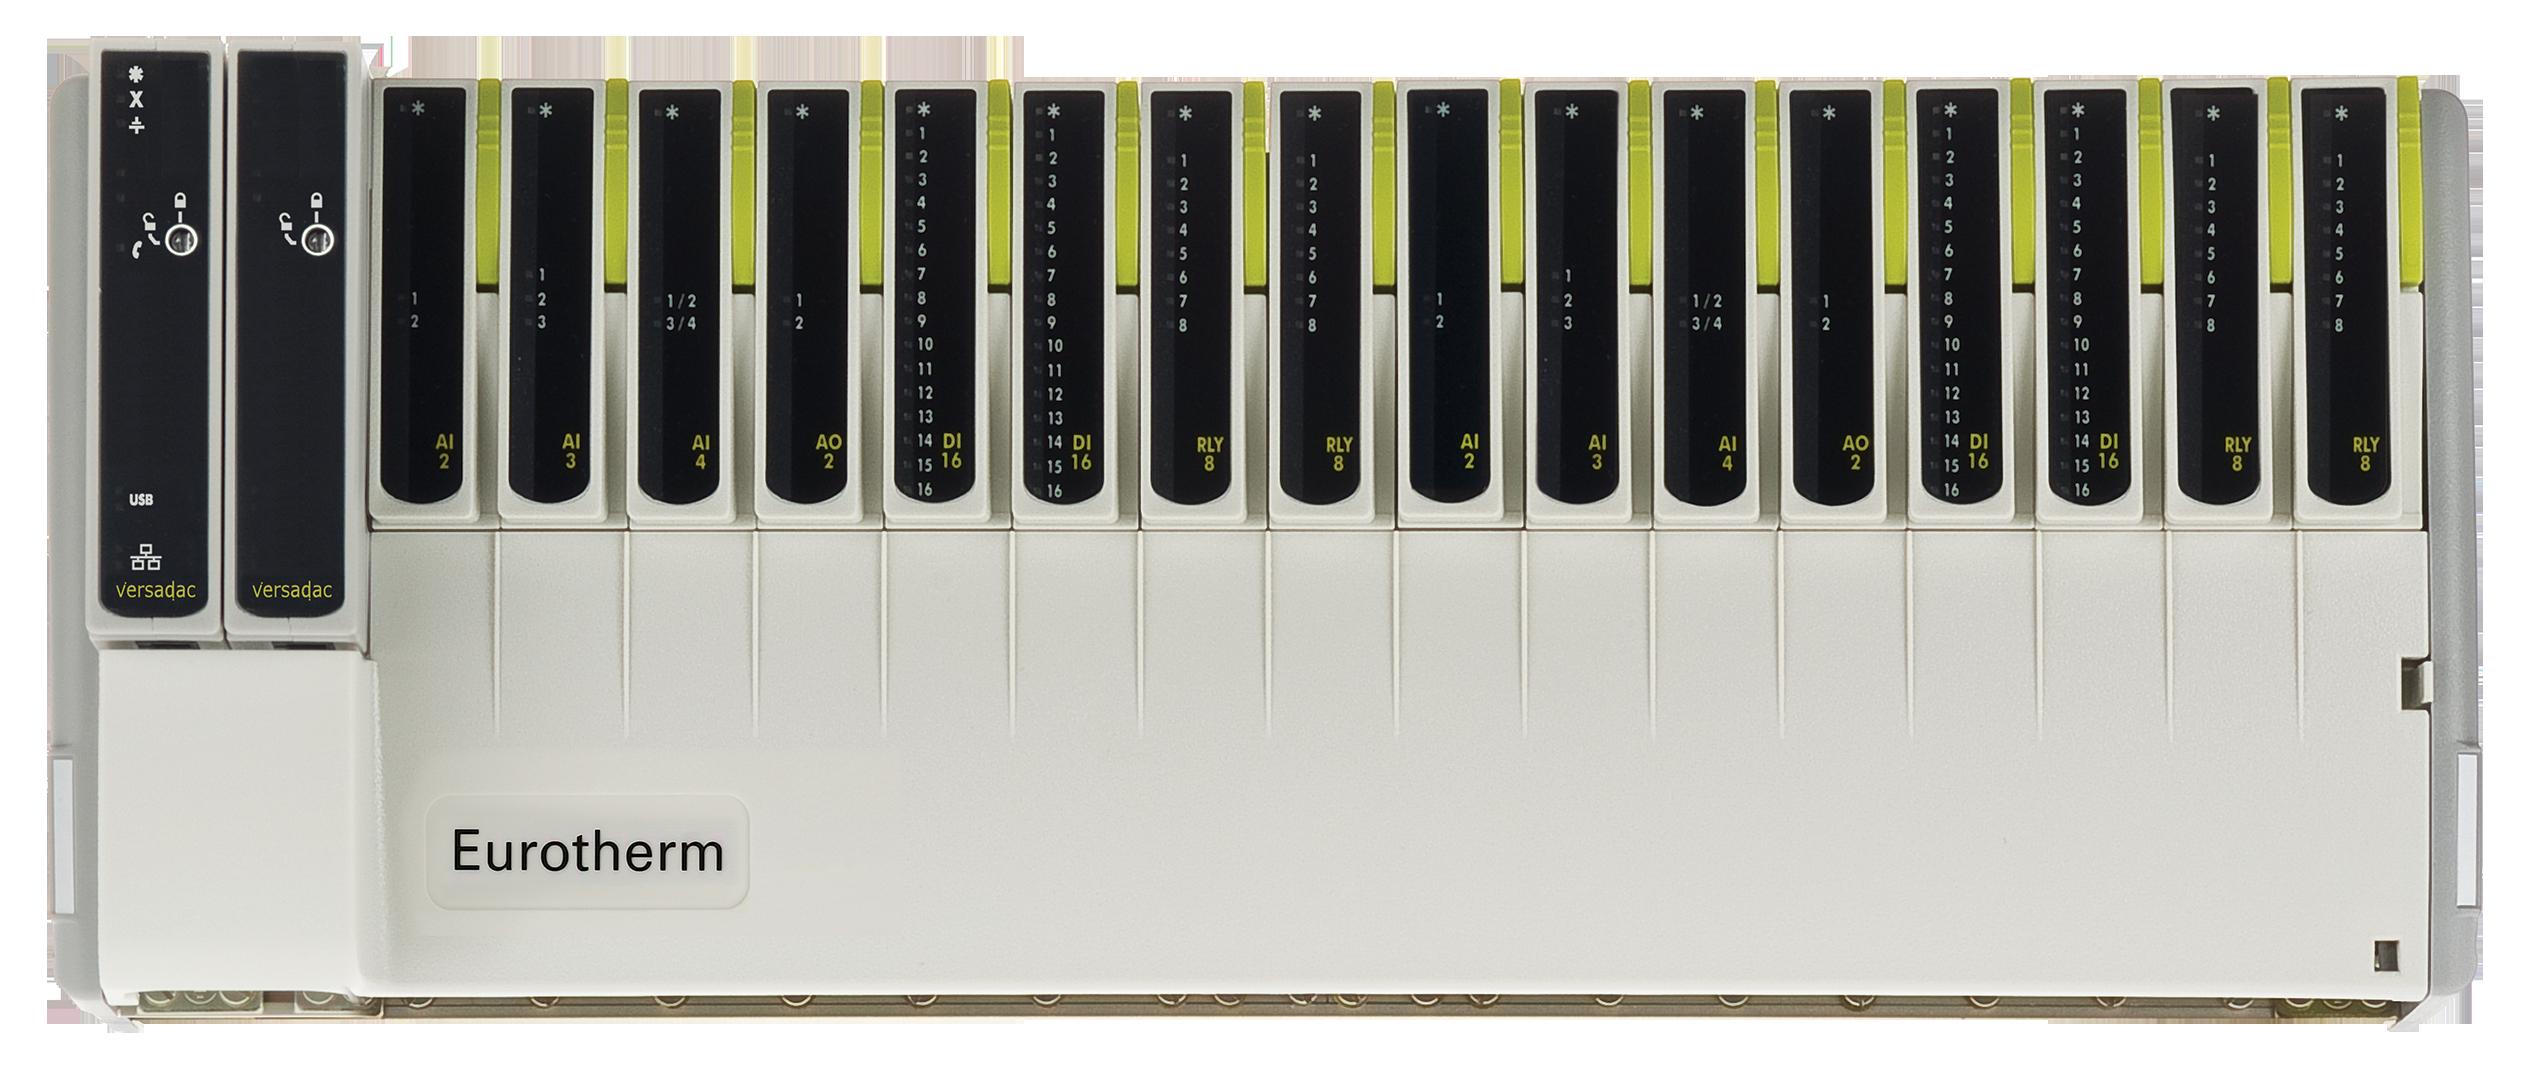 versadac TM Scalable Data Recorder Eurotherm Product